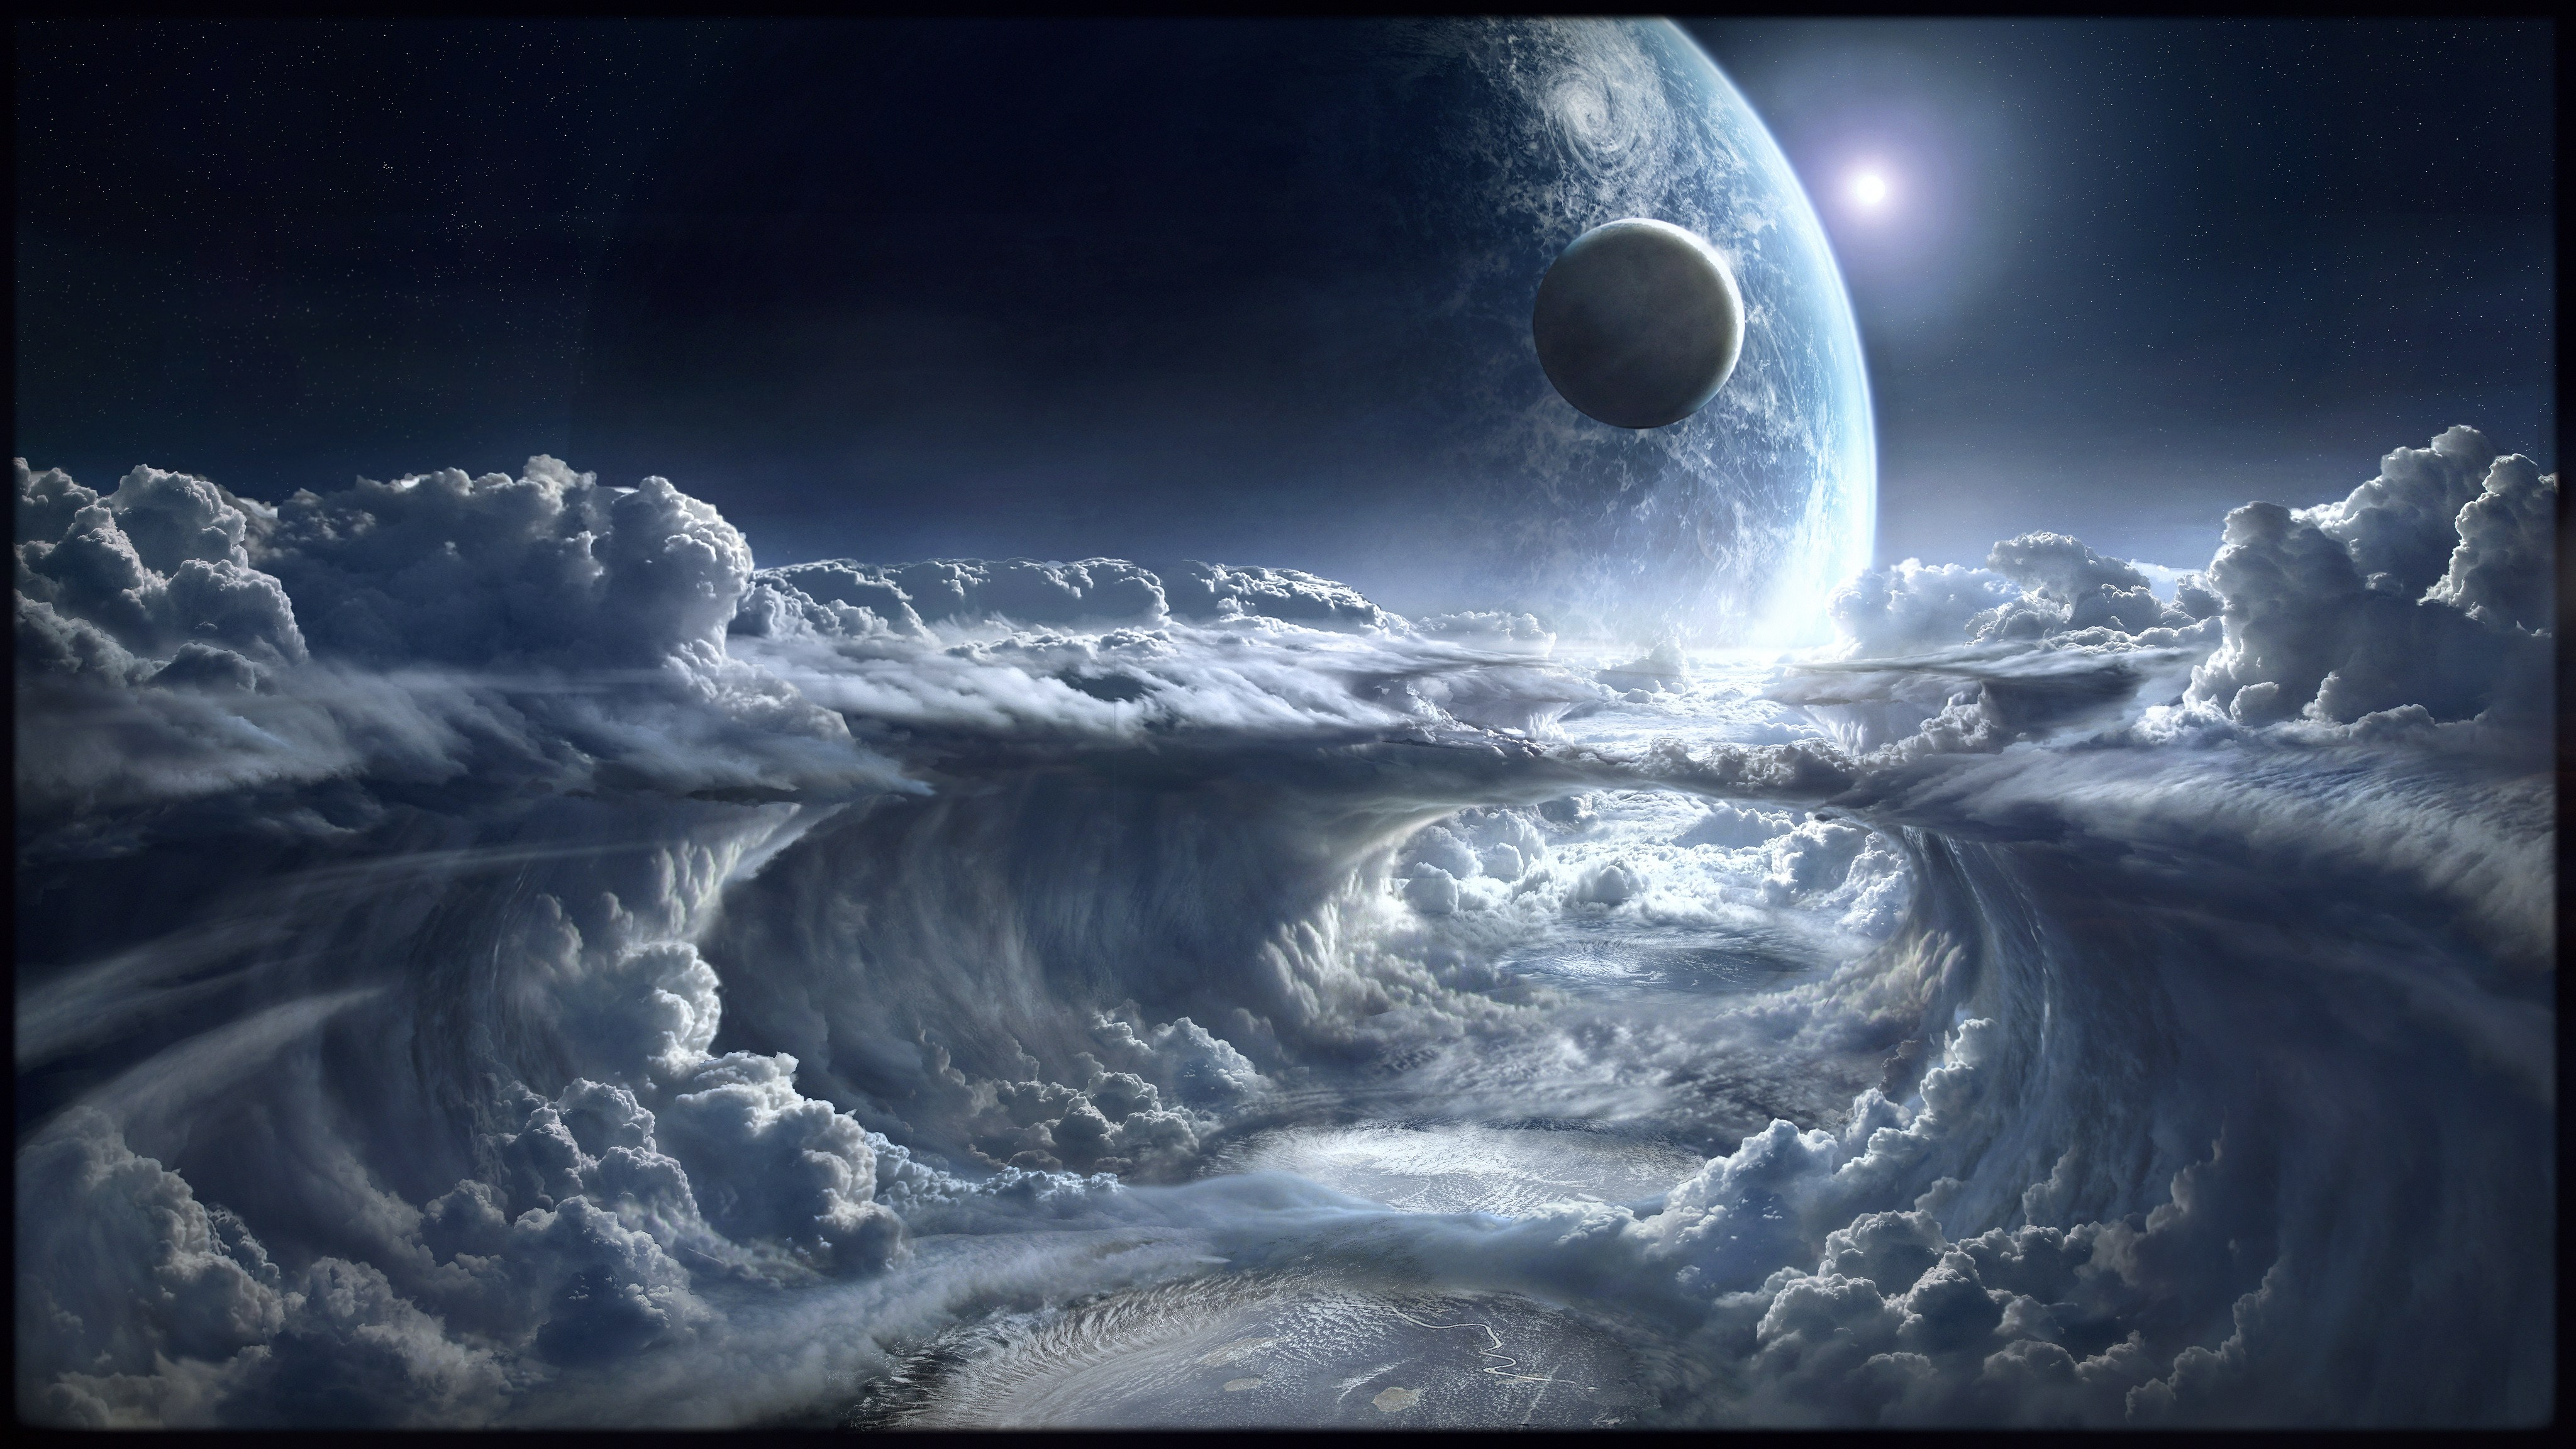 Sci Fi Space Planet Cloud 4096x2304